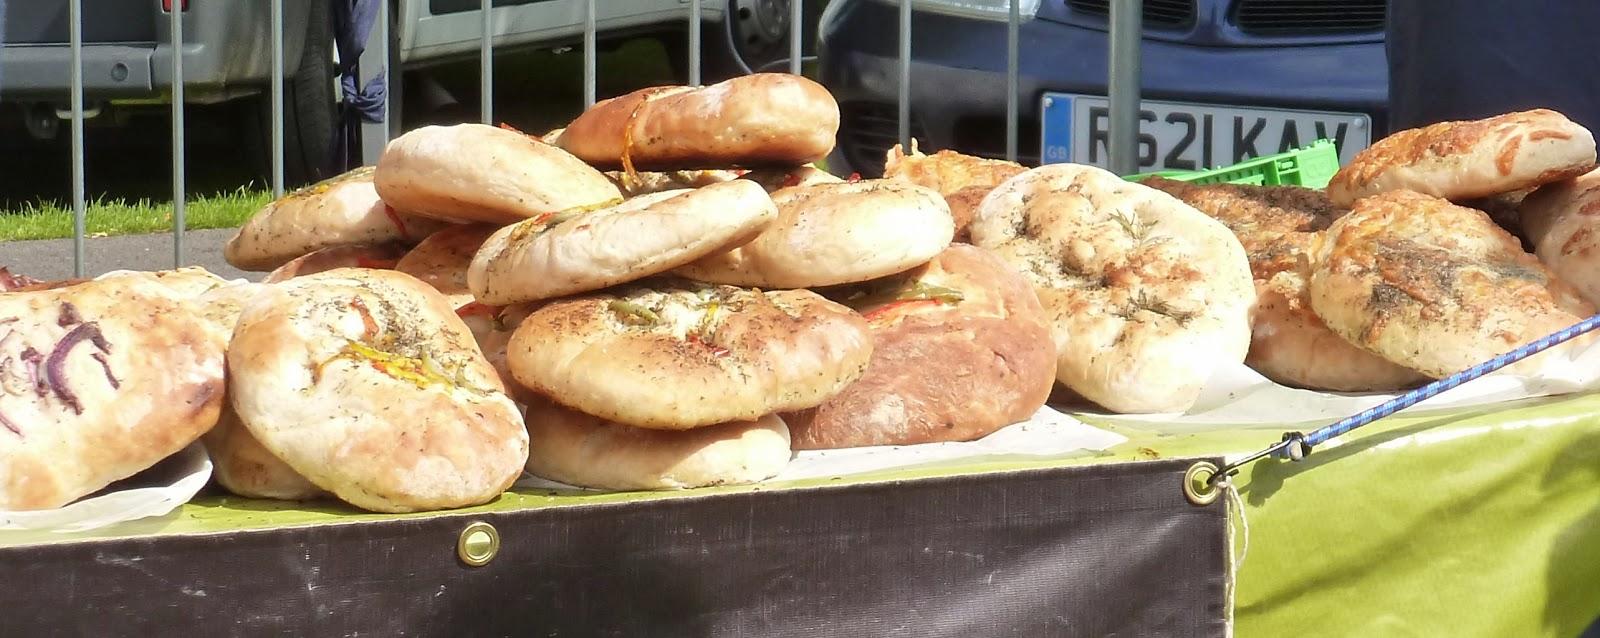 The great british food festival 2014 fresh bread